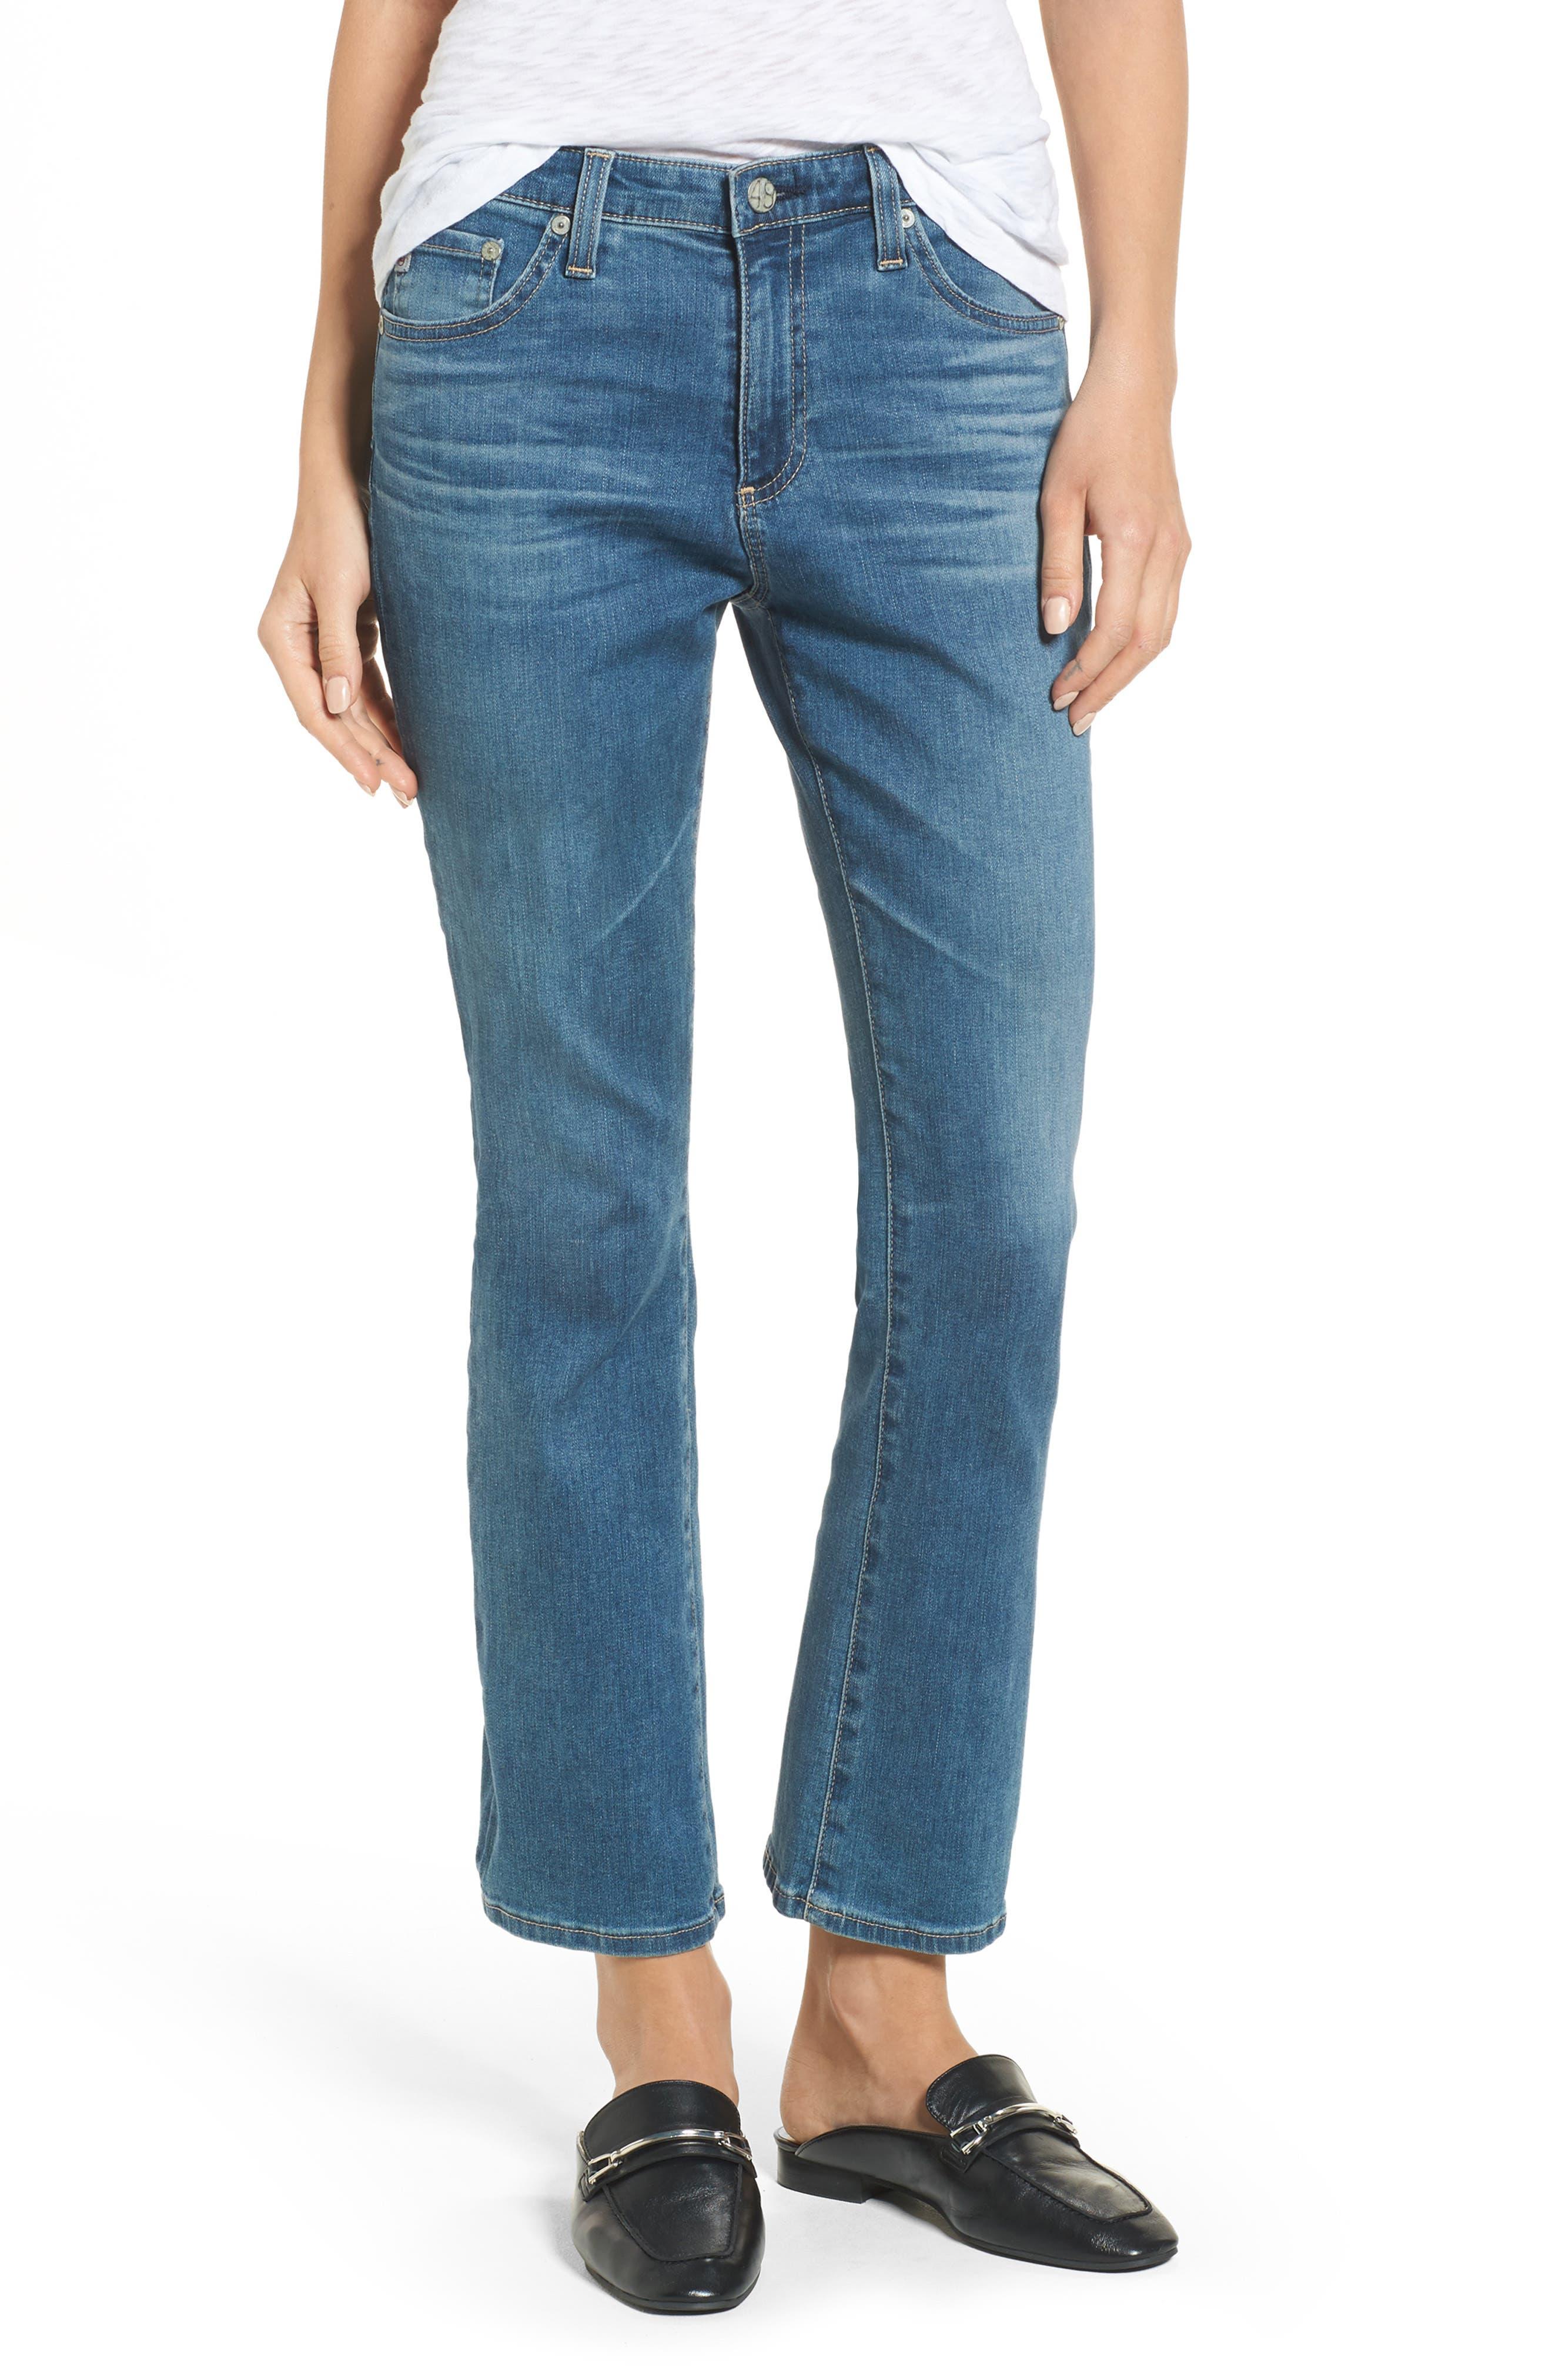 Alternate Image 1 Selected - AG Jodi High Waist Crop Jeans (10 Years Sea Mist)